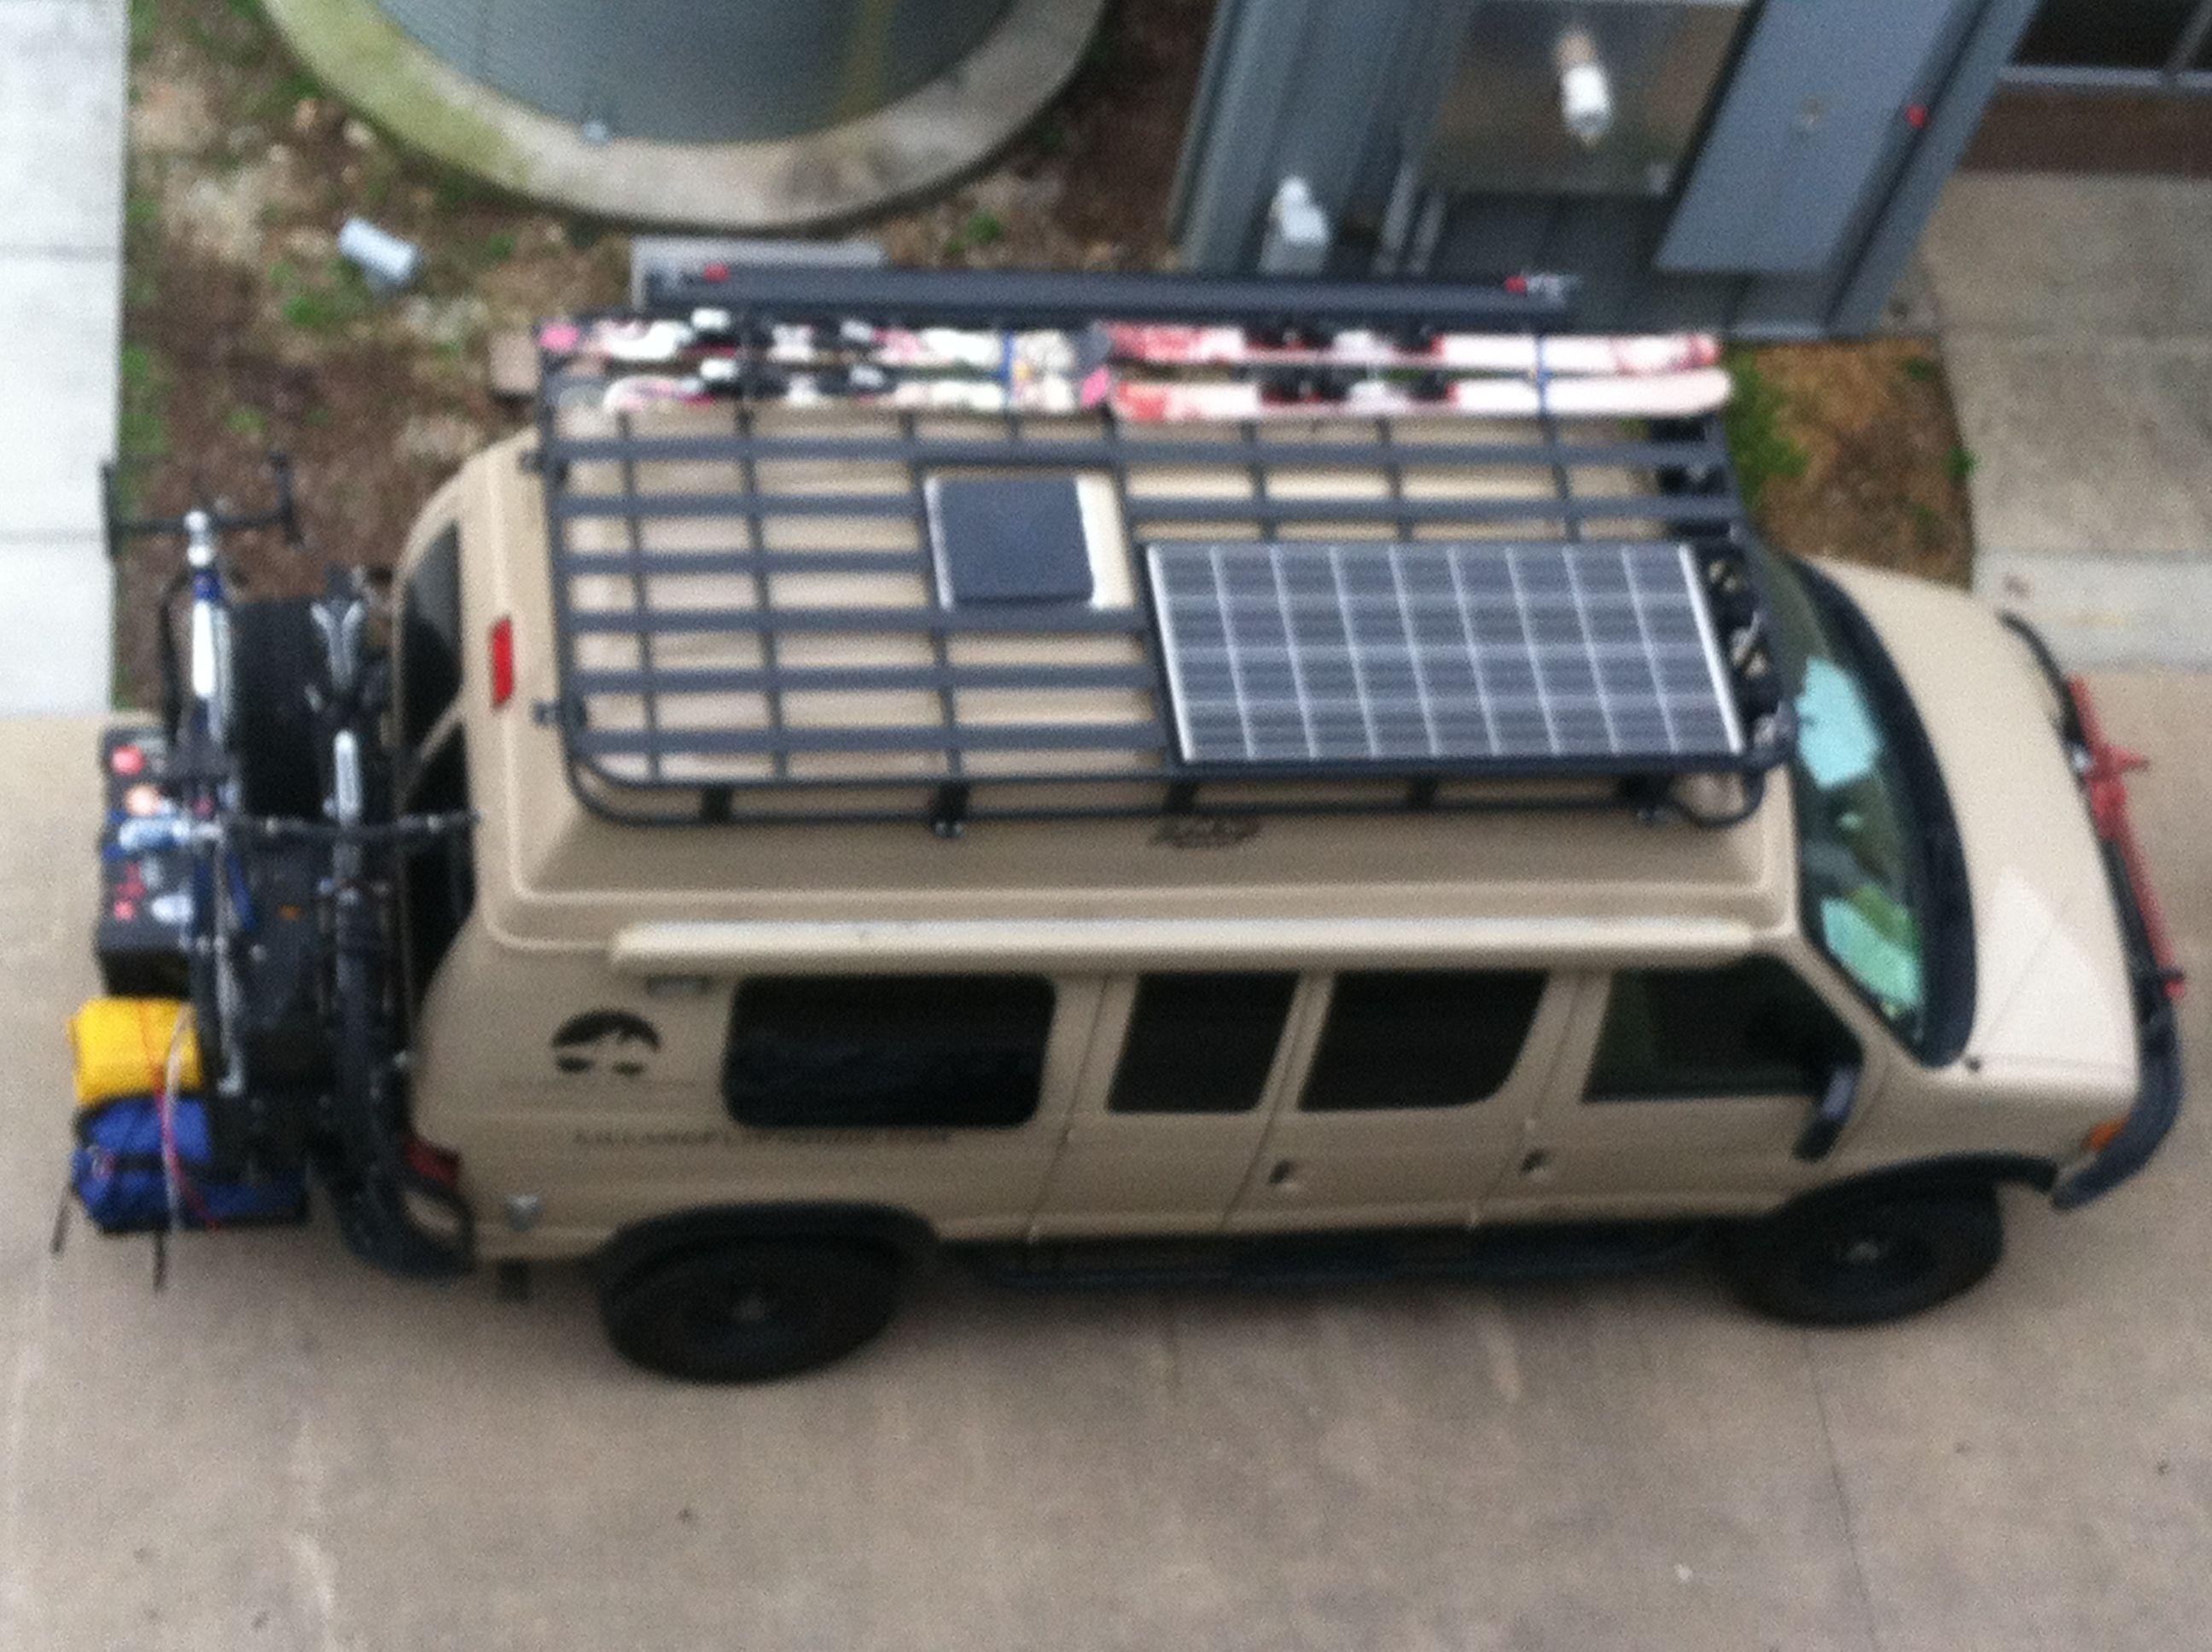 Ariel Sportsmobile Shot Solar Panel And Skis With Images 4x4 Van Travel Camper Camper